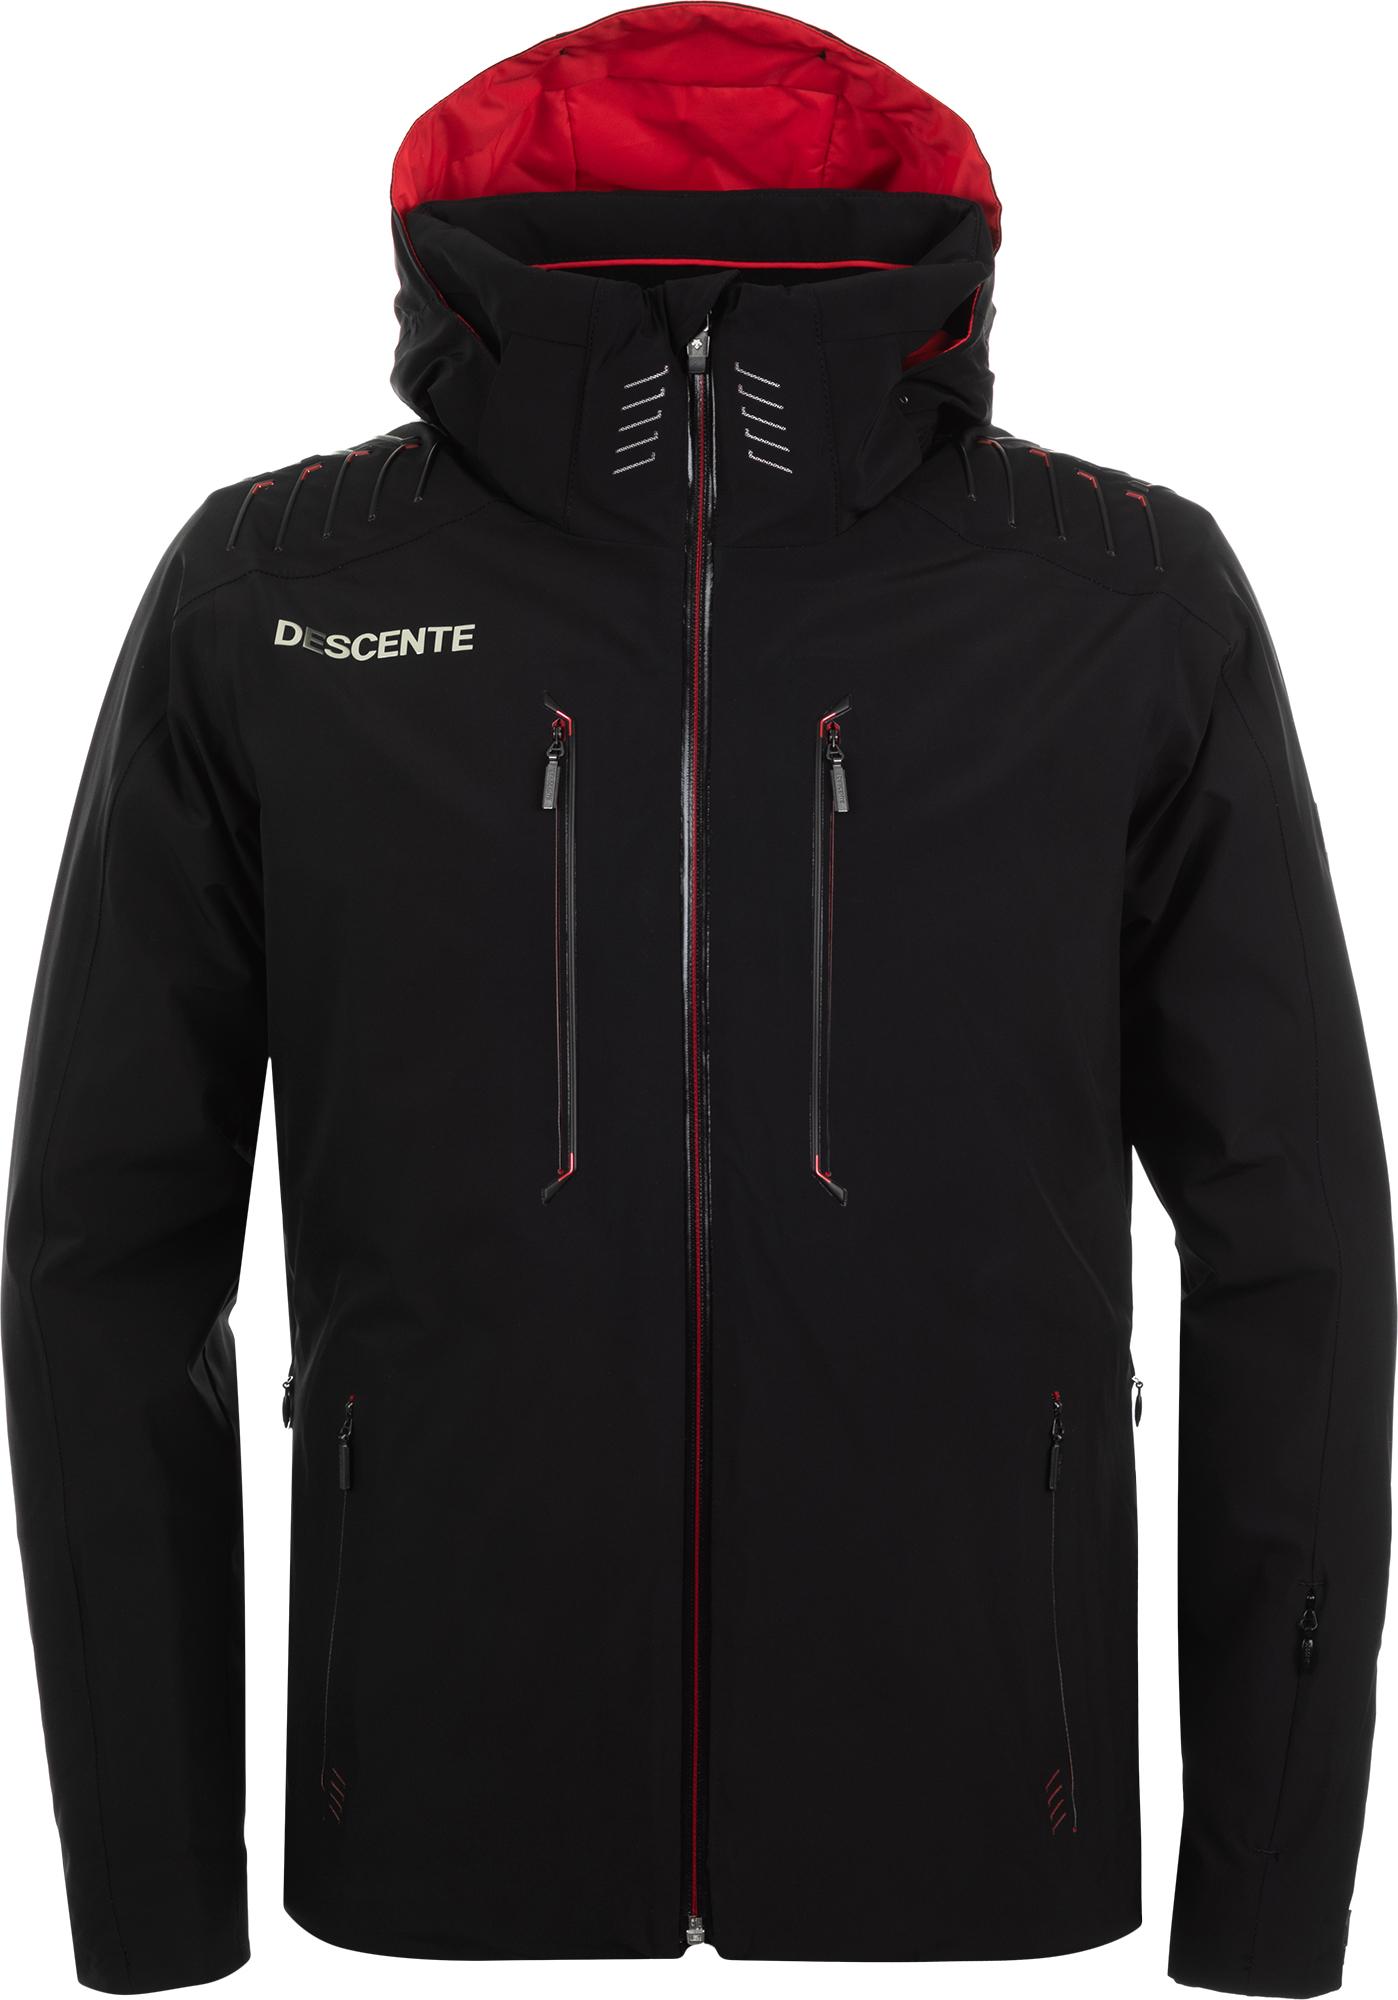 Descente Куртка утепленная мужская Descente Scorpion, размер 54